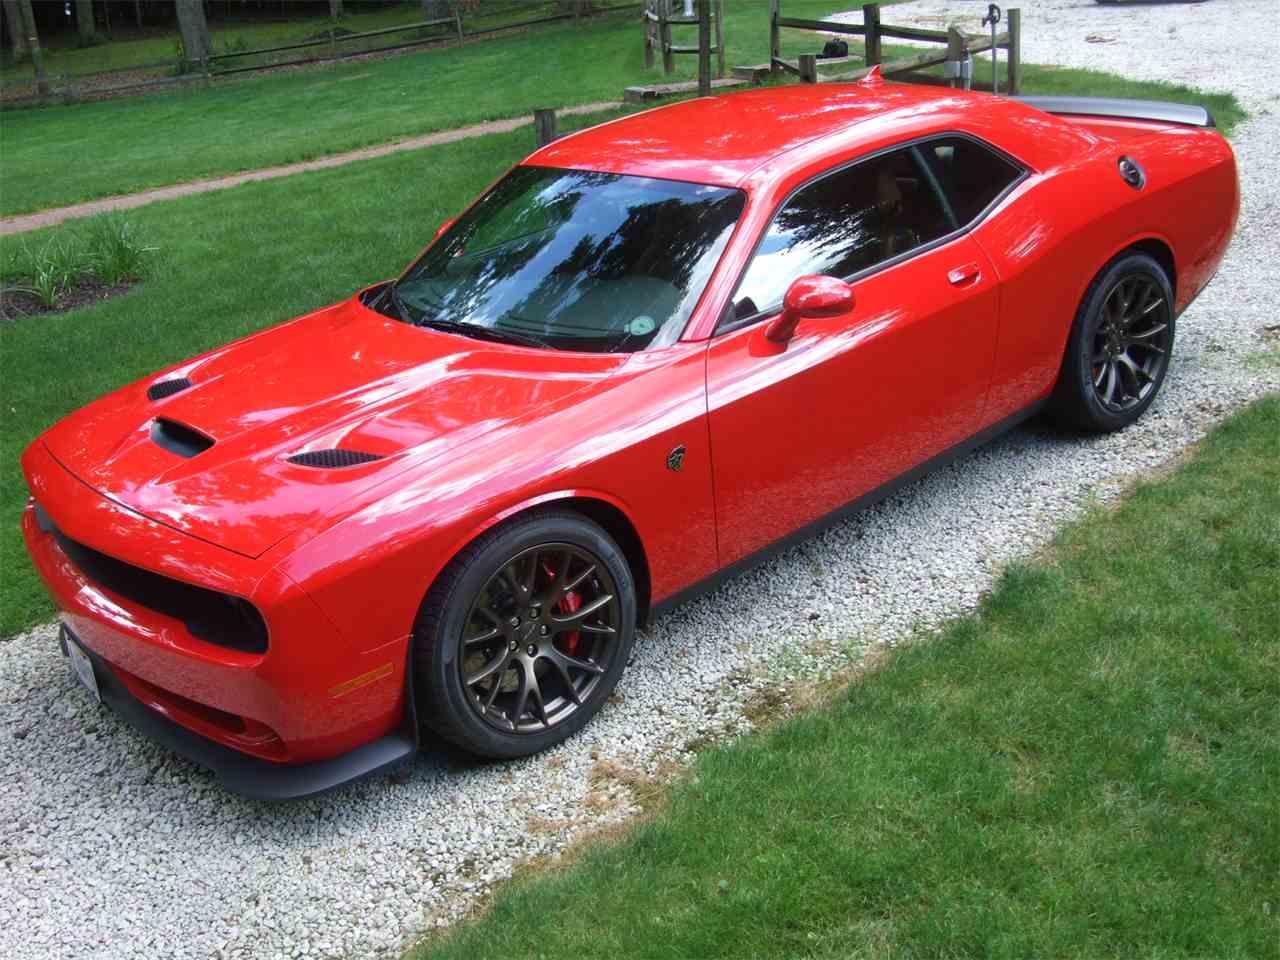 2015 Dodge Challenger for Sale - CC-996517